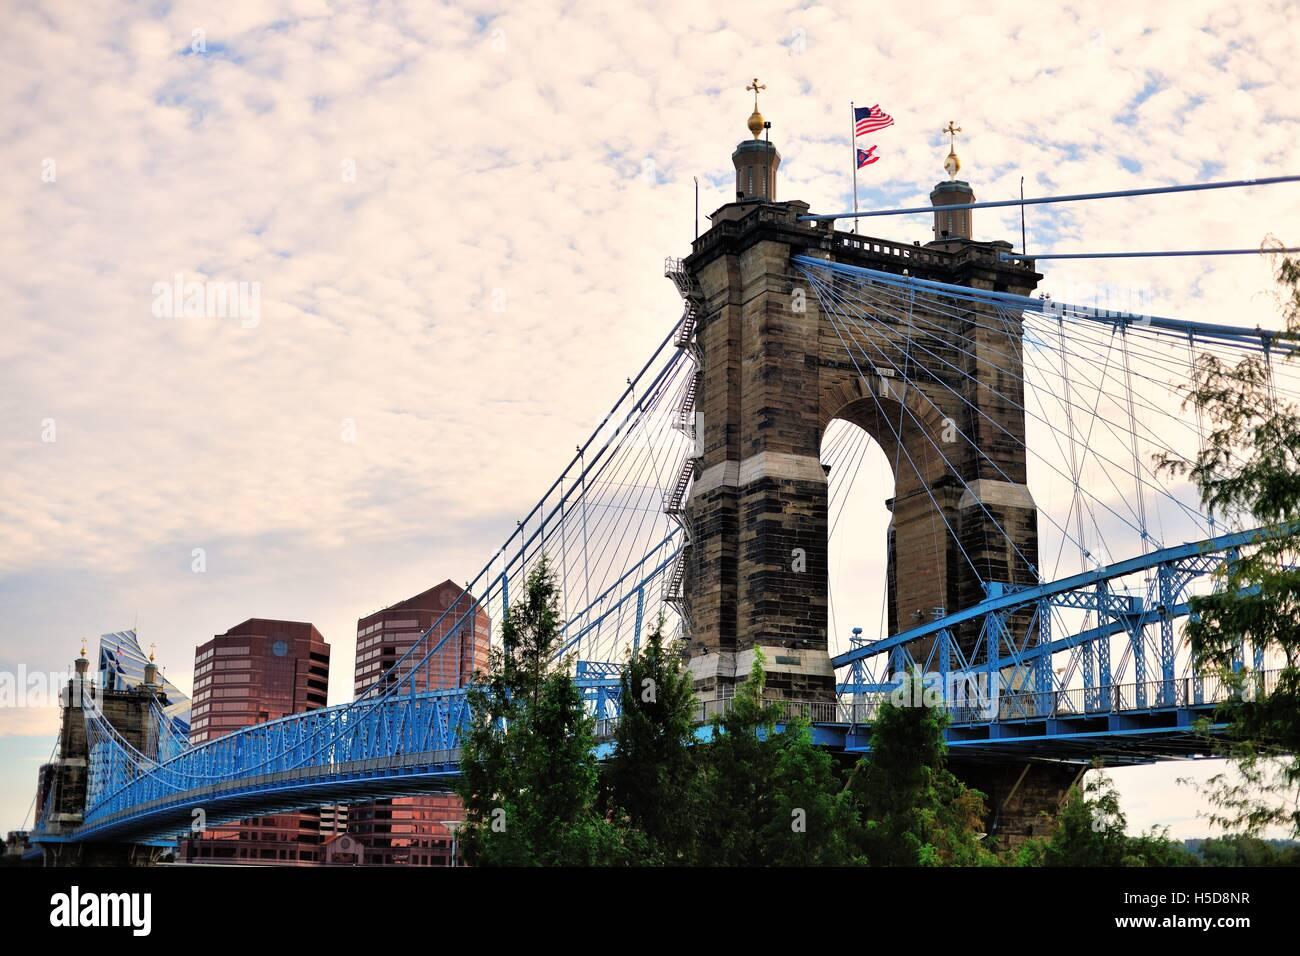 The John A. Roebling Suspension Bridge spanning the Ohio River between Cincinnati, Ohio and Covington, Kentucky. Stock Photo